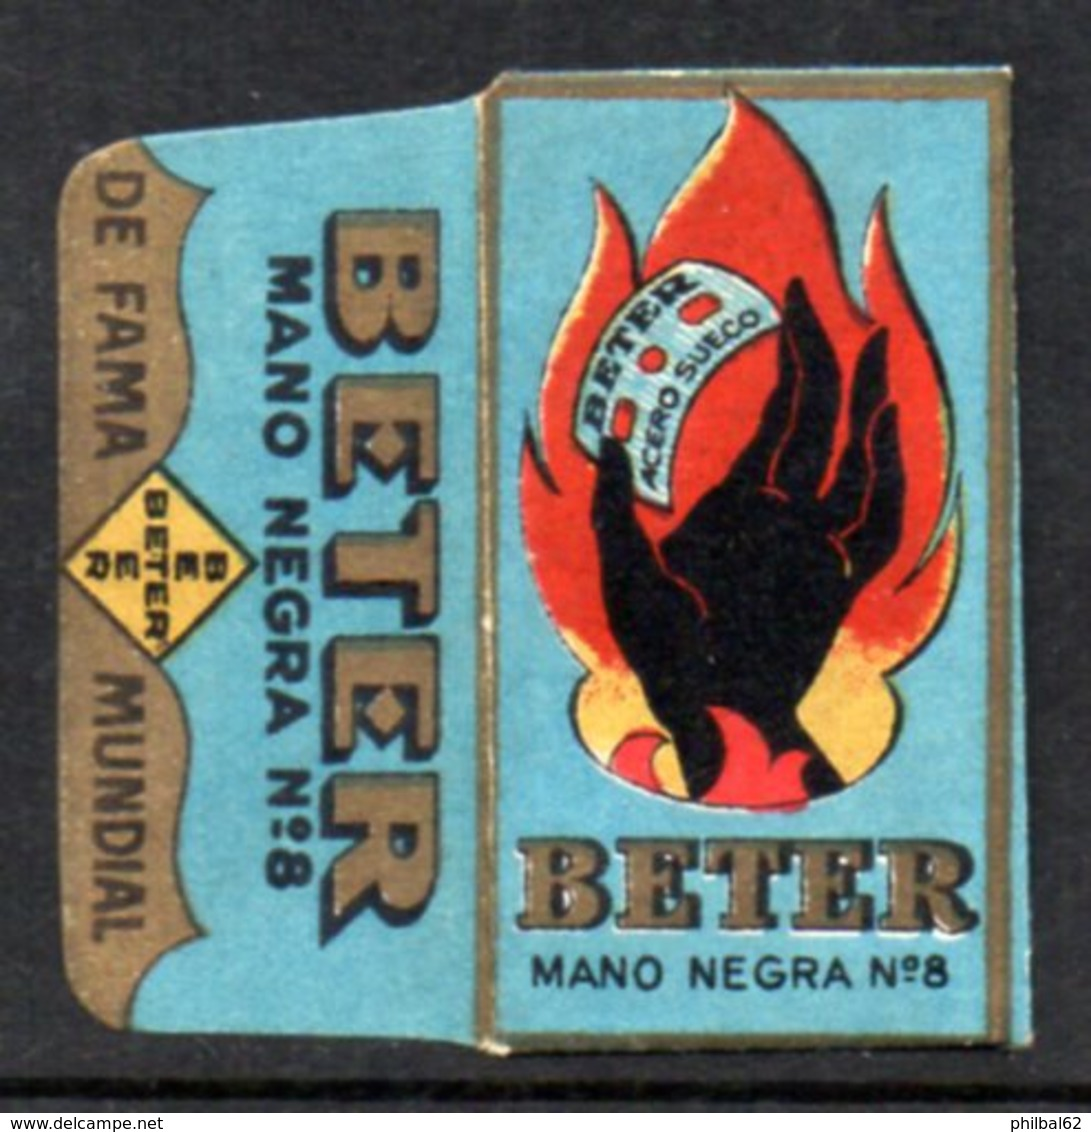 Rasage. Razor Blade. Lame De Rasoir. Lame Beter, Mano Negra N°8, Fabrication Espagnole. - Razor Blades